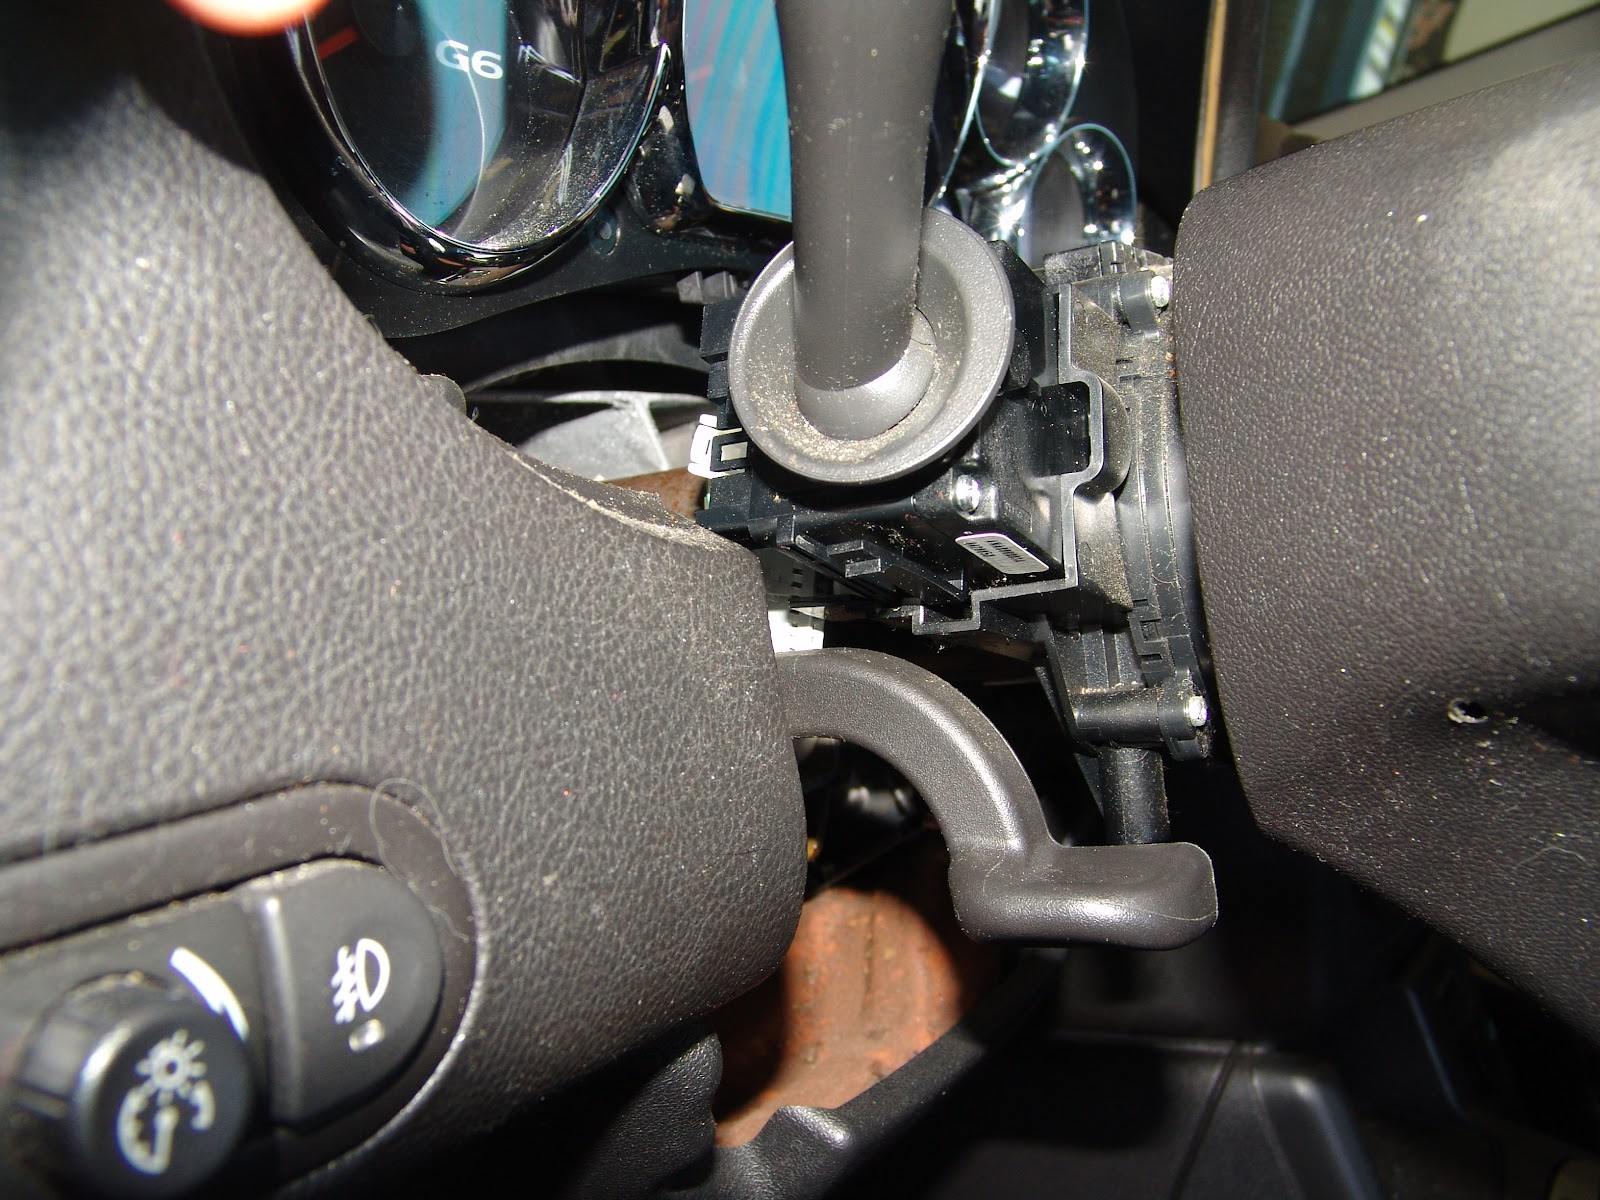 1989 GMC Sierra 1500 Wiring Diagram additionally 2008 Chevy Equinox Wiring Diagram as well 2006 Pontiac G6 Turn Signal Switch moreover 1998 Chevy Lumina Water Pump likewise Silverado Fuse Box Diagram. on power window motor replacement 2006 silverado